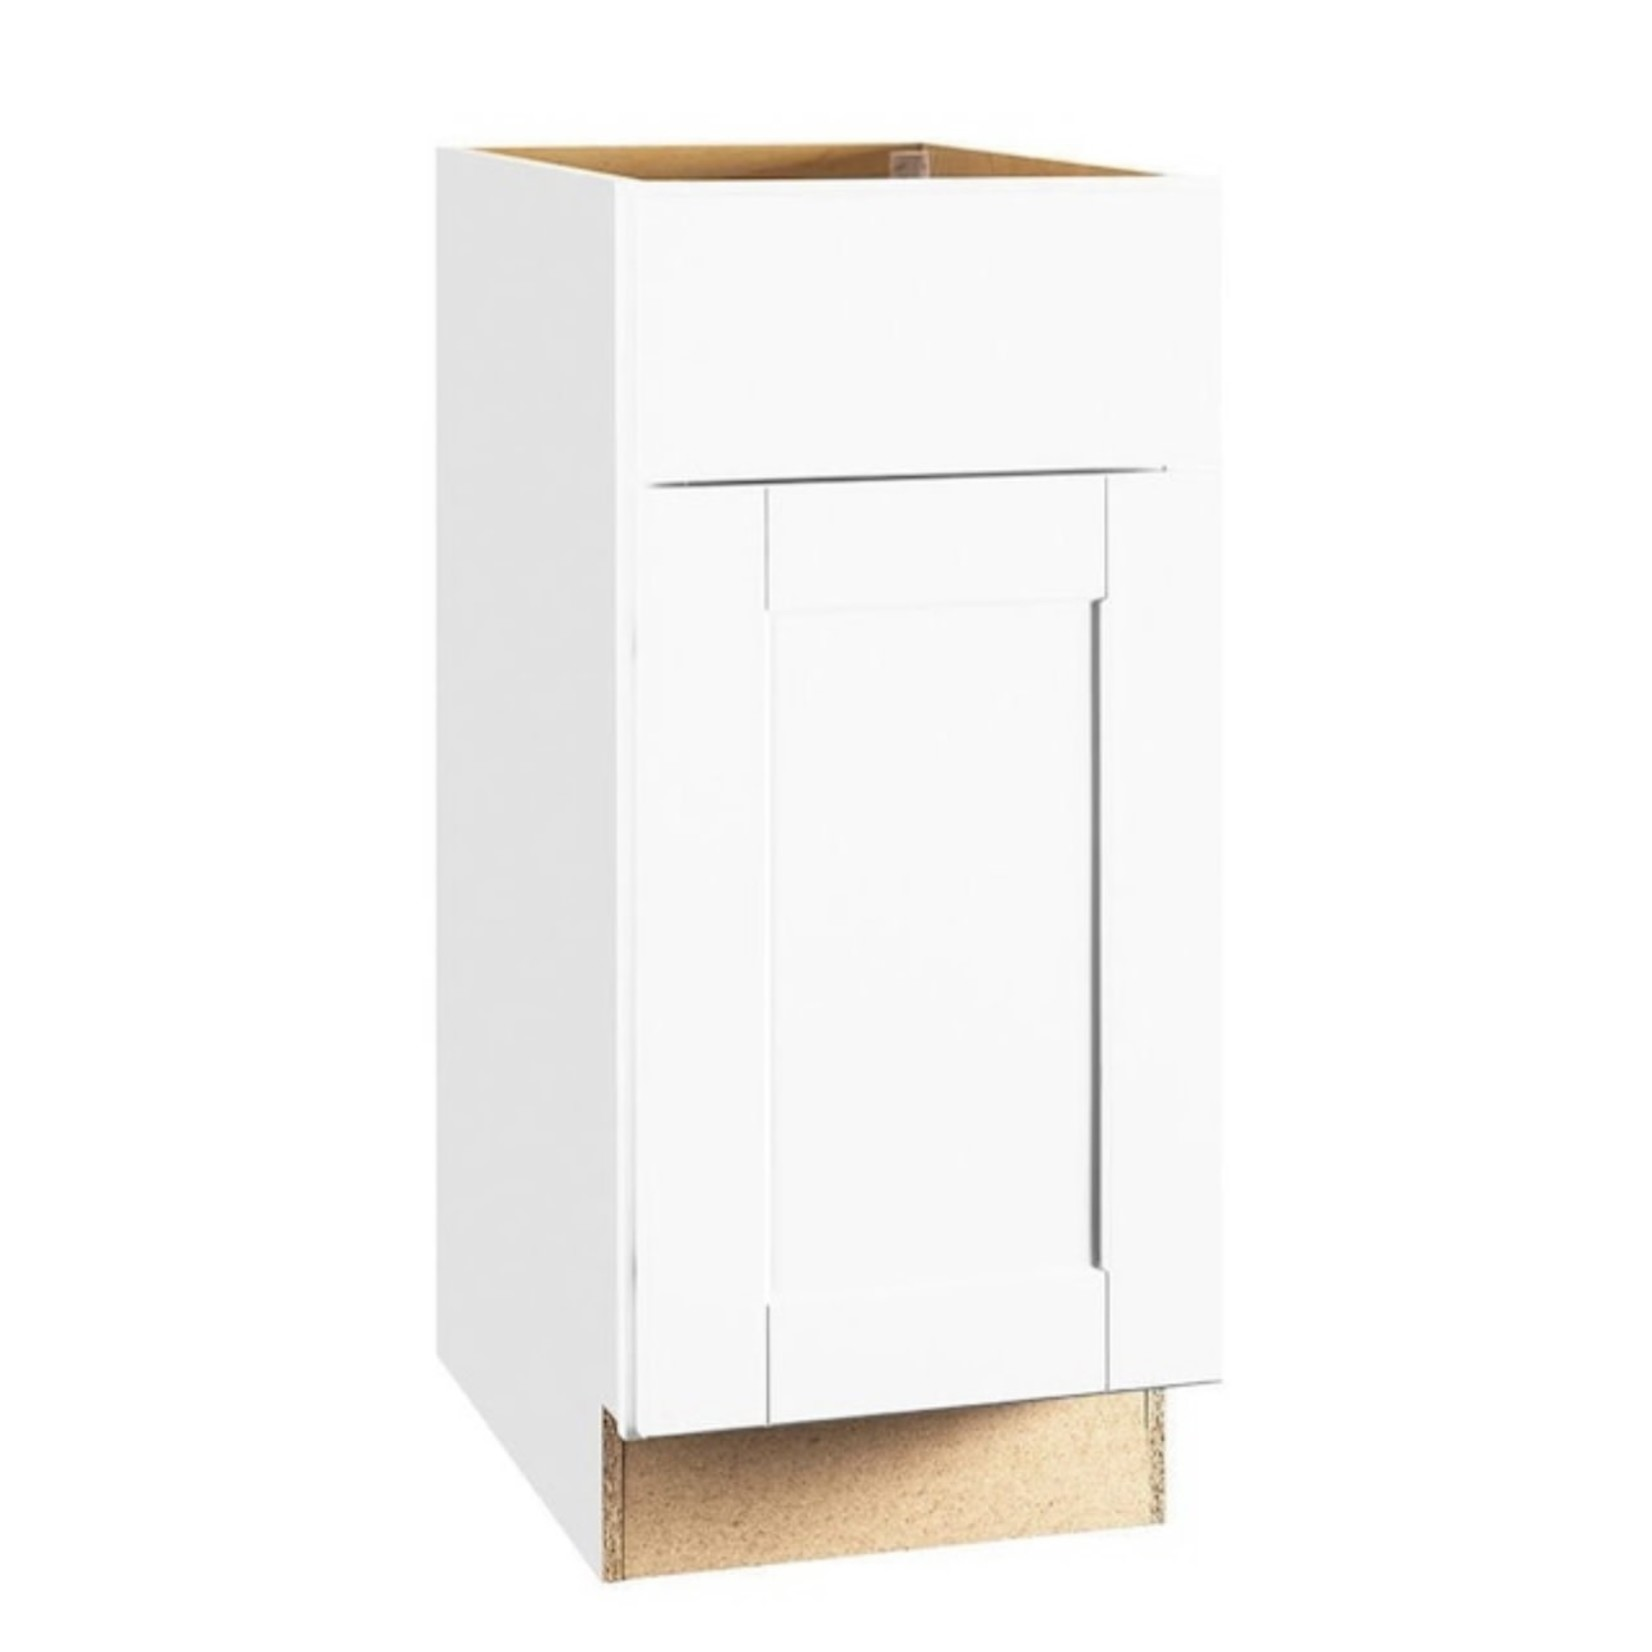 10205 Hampton Bay Shaker Style Base Cabinet